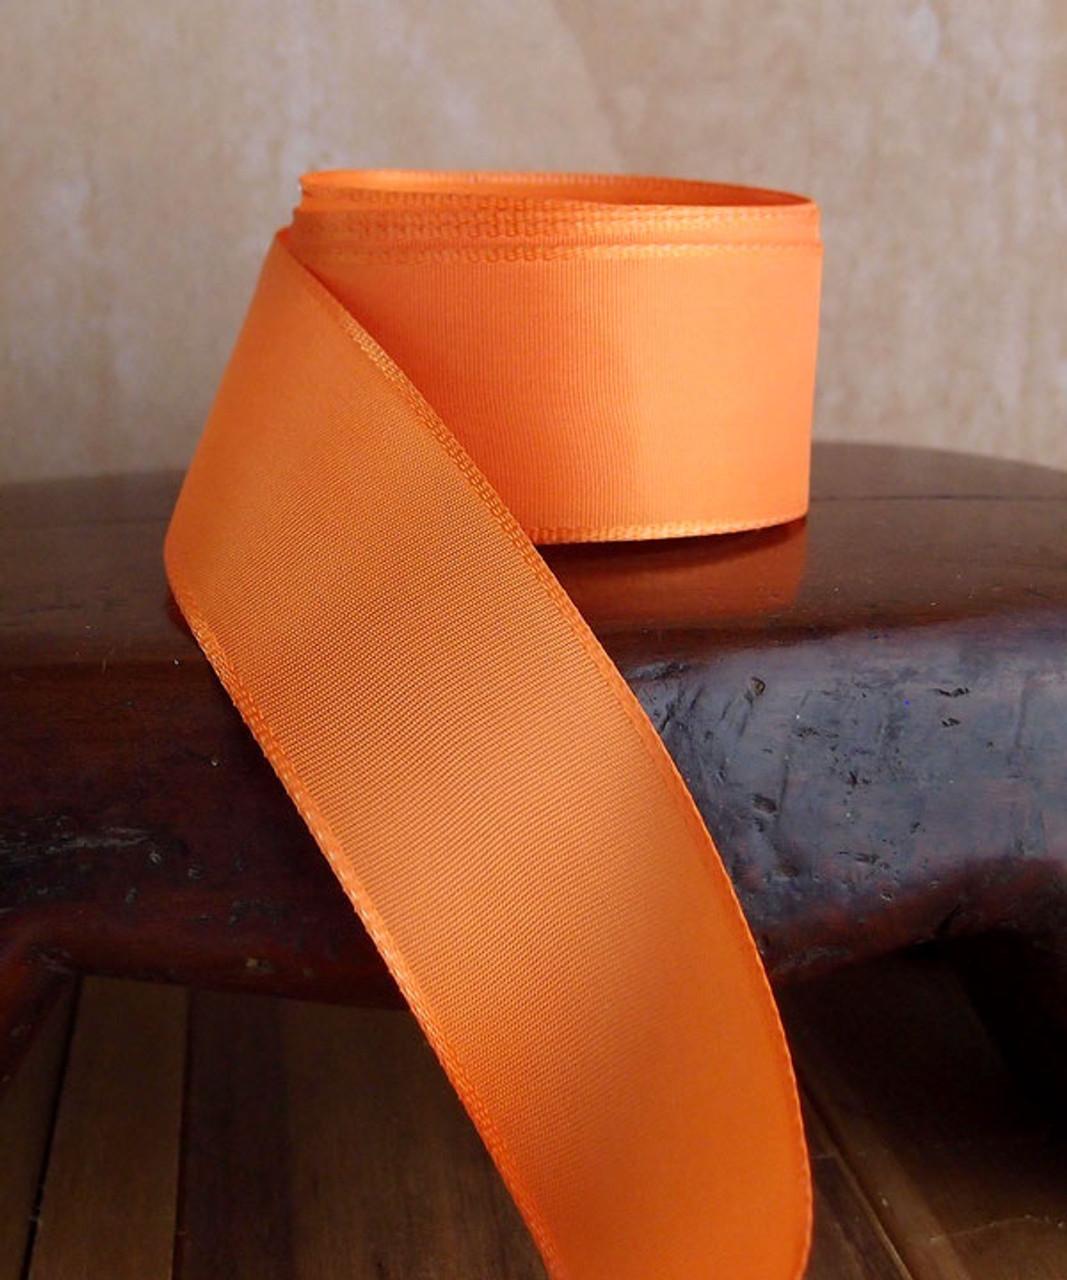 Orange Florist's Choice Ribbon with Wire Edge (2 sizes)